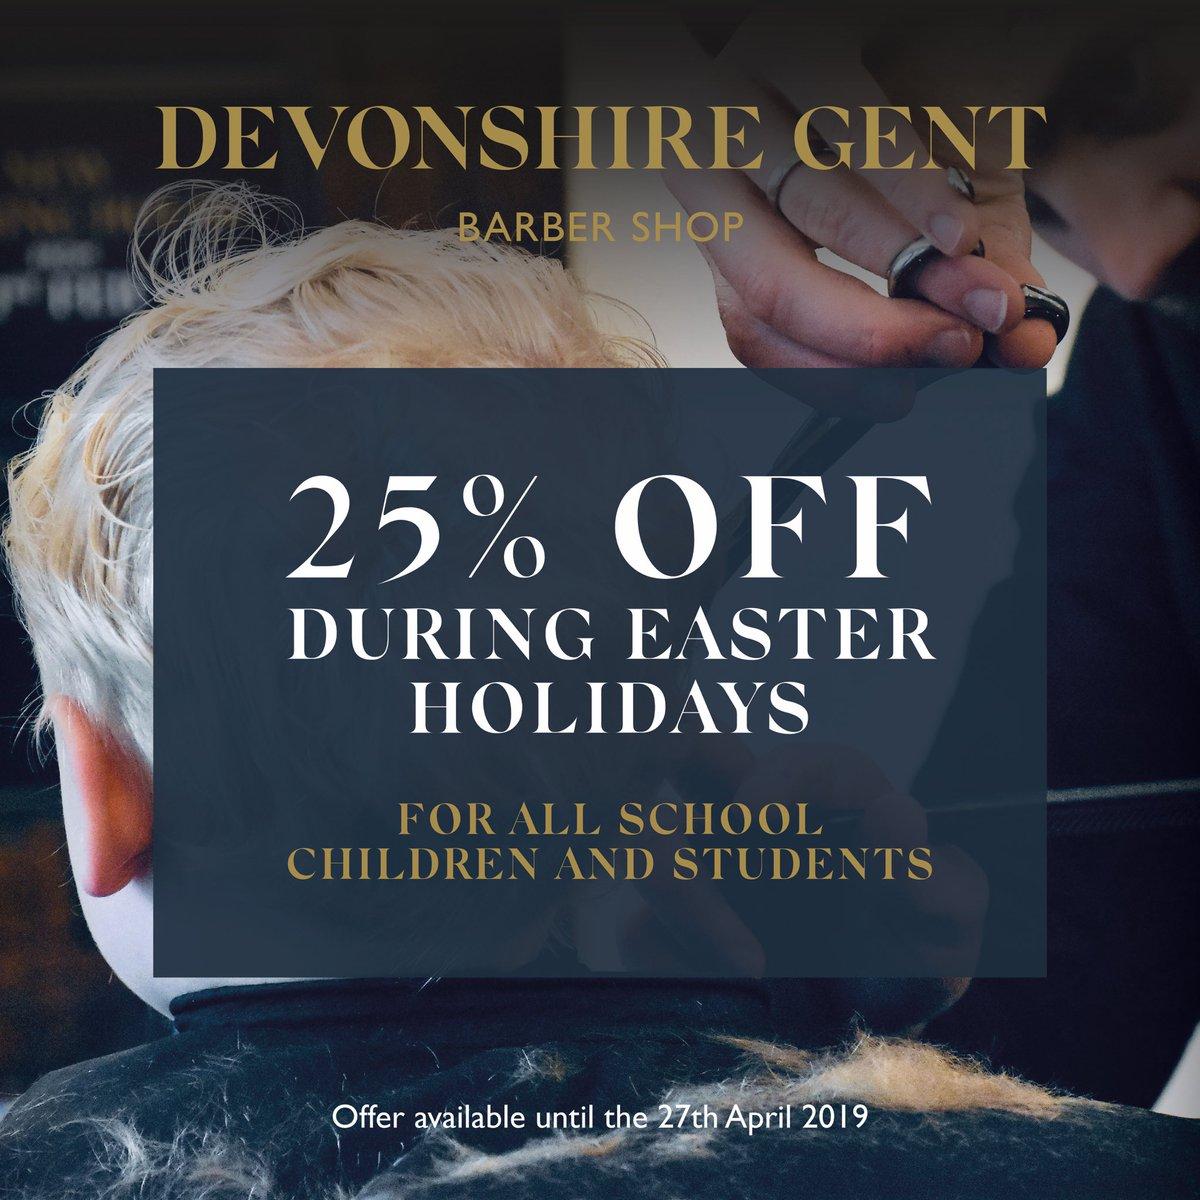 It's 25% OFF for all school kids & students at Devonshire Gent Barbers over the Easter holidays! #Harrogate #barber #familybarber #menshair #EasterHolidayspic.twitter.com/XLZ5hft3bd